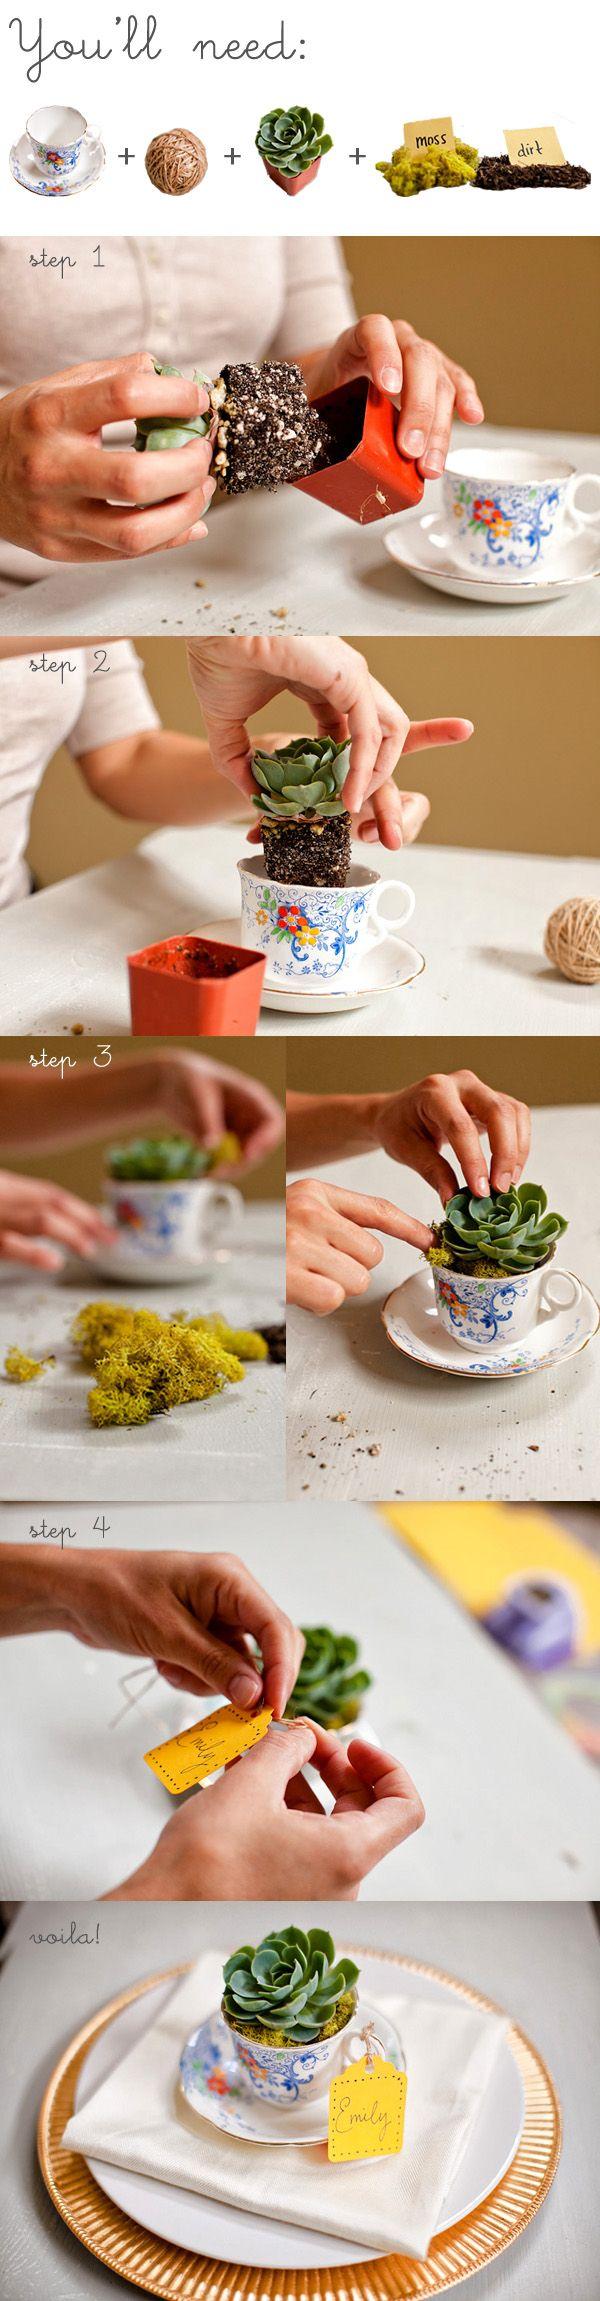 .succulent in tea cup.